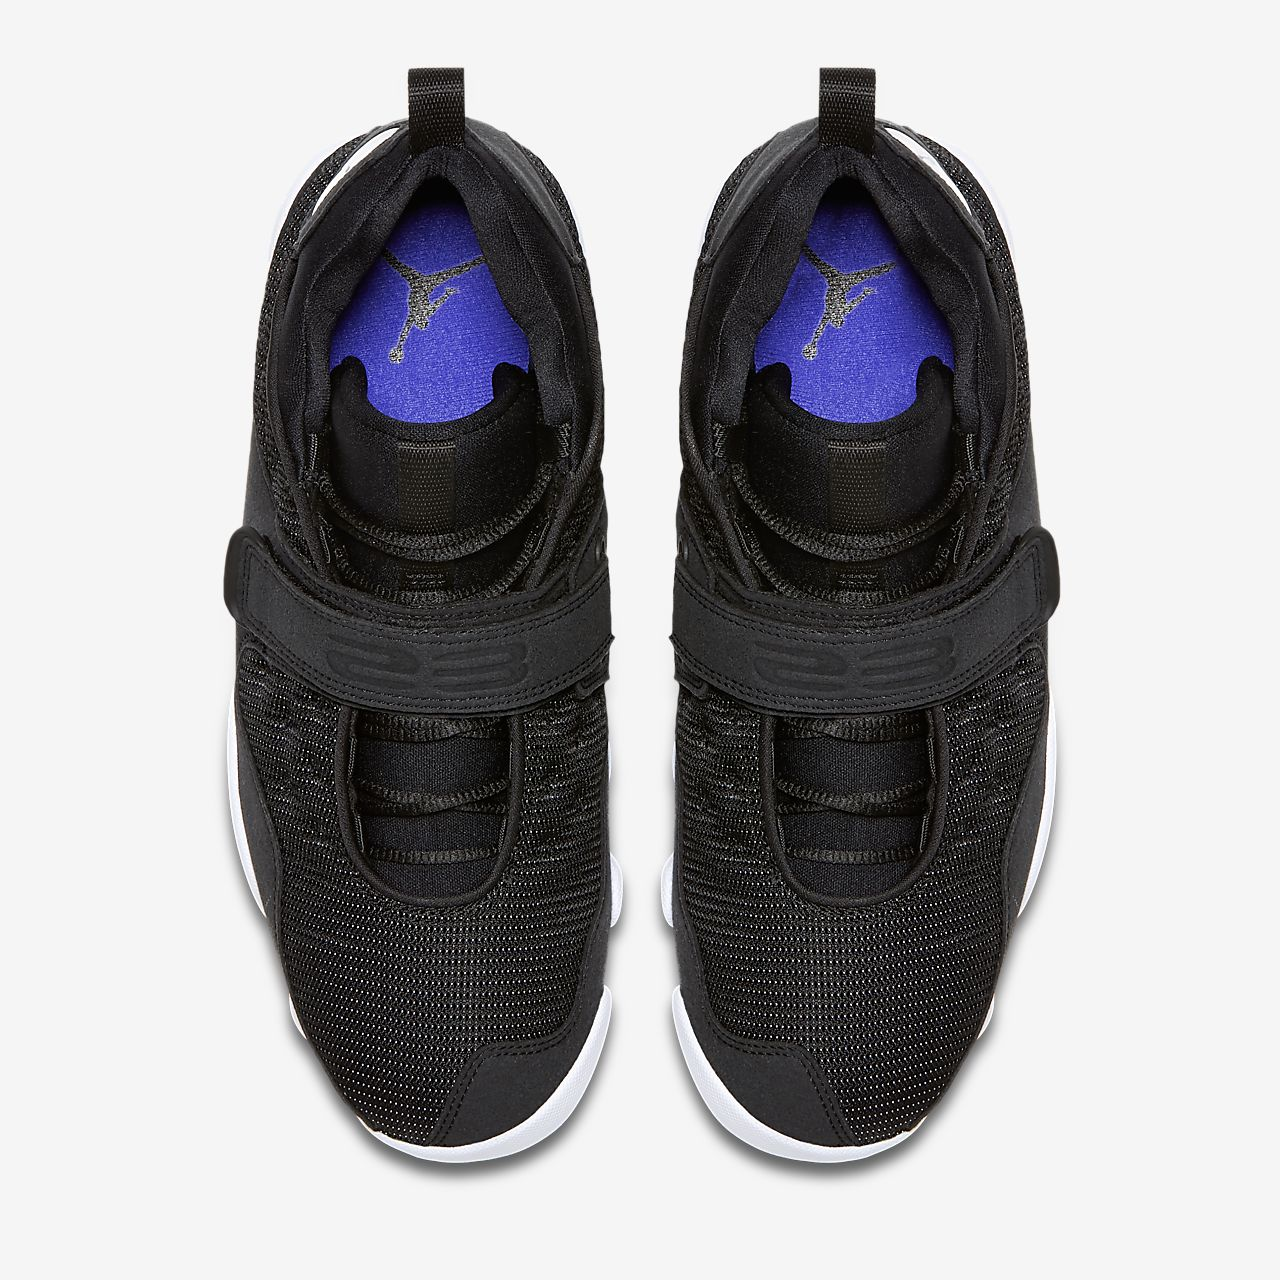 eb324e8ae9a680 Low Resolution Jordan Black Cat Men s Shoe Jordan Black Cat Men s Shoe